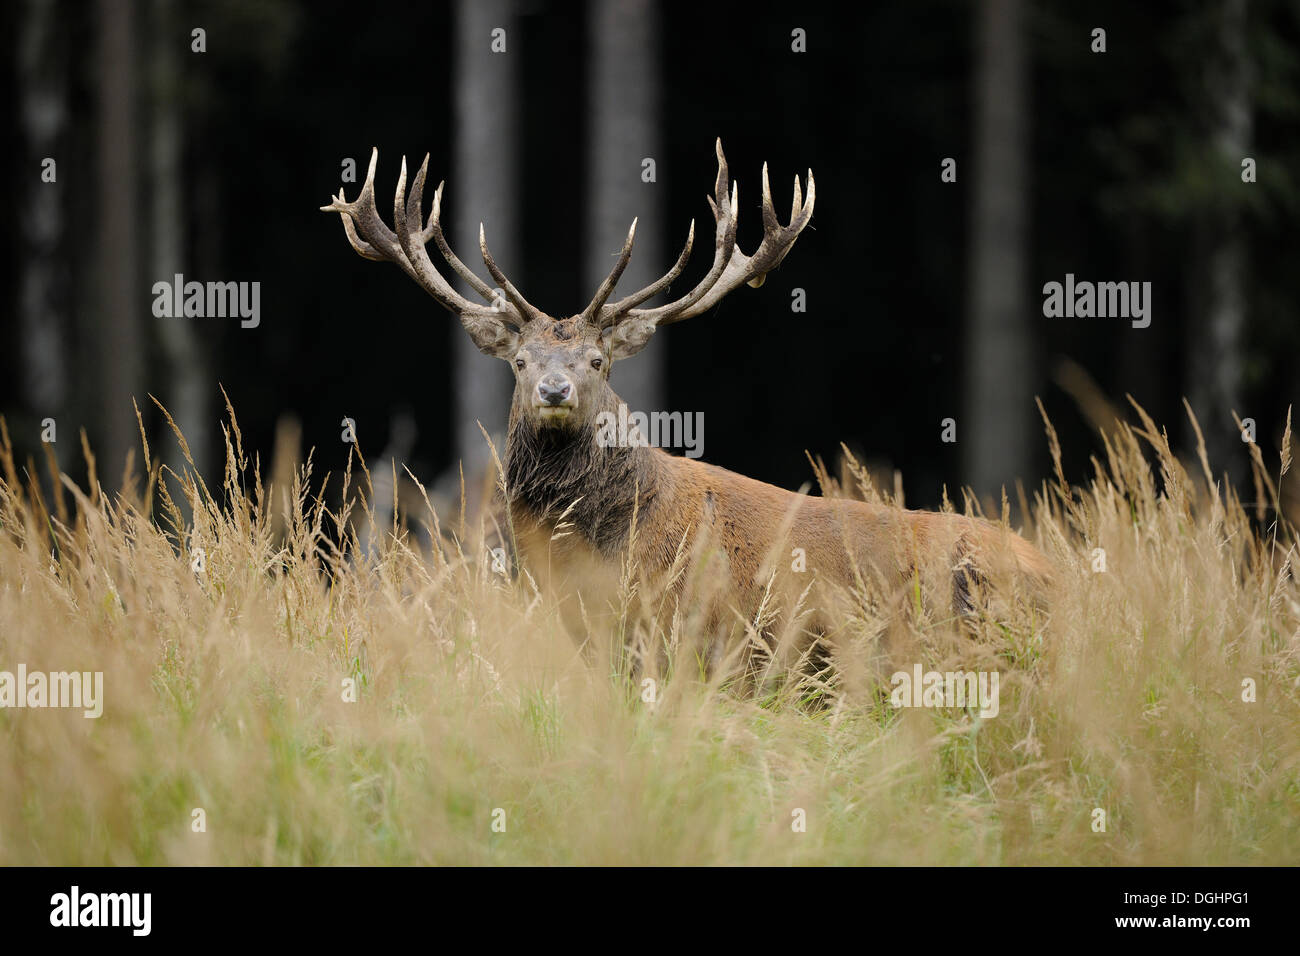 Ciervo rojo (Cervus elaphus), Stag, cautiva, Baja Sajonia, Alemania Foto de stock